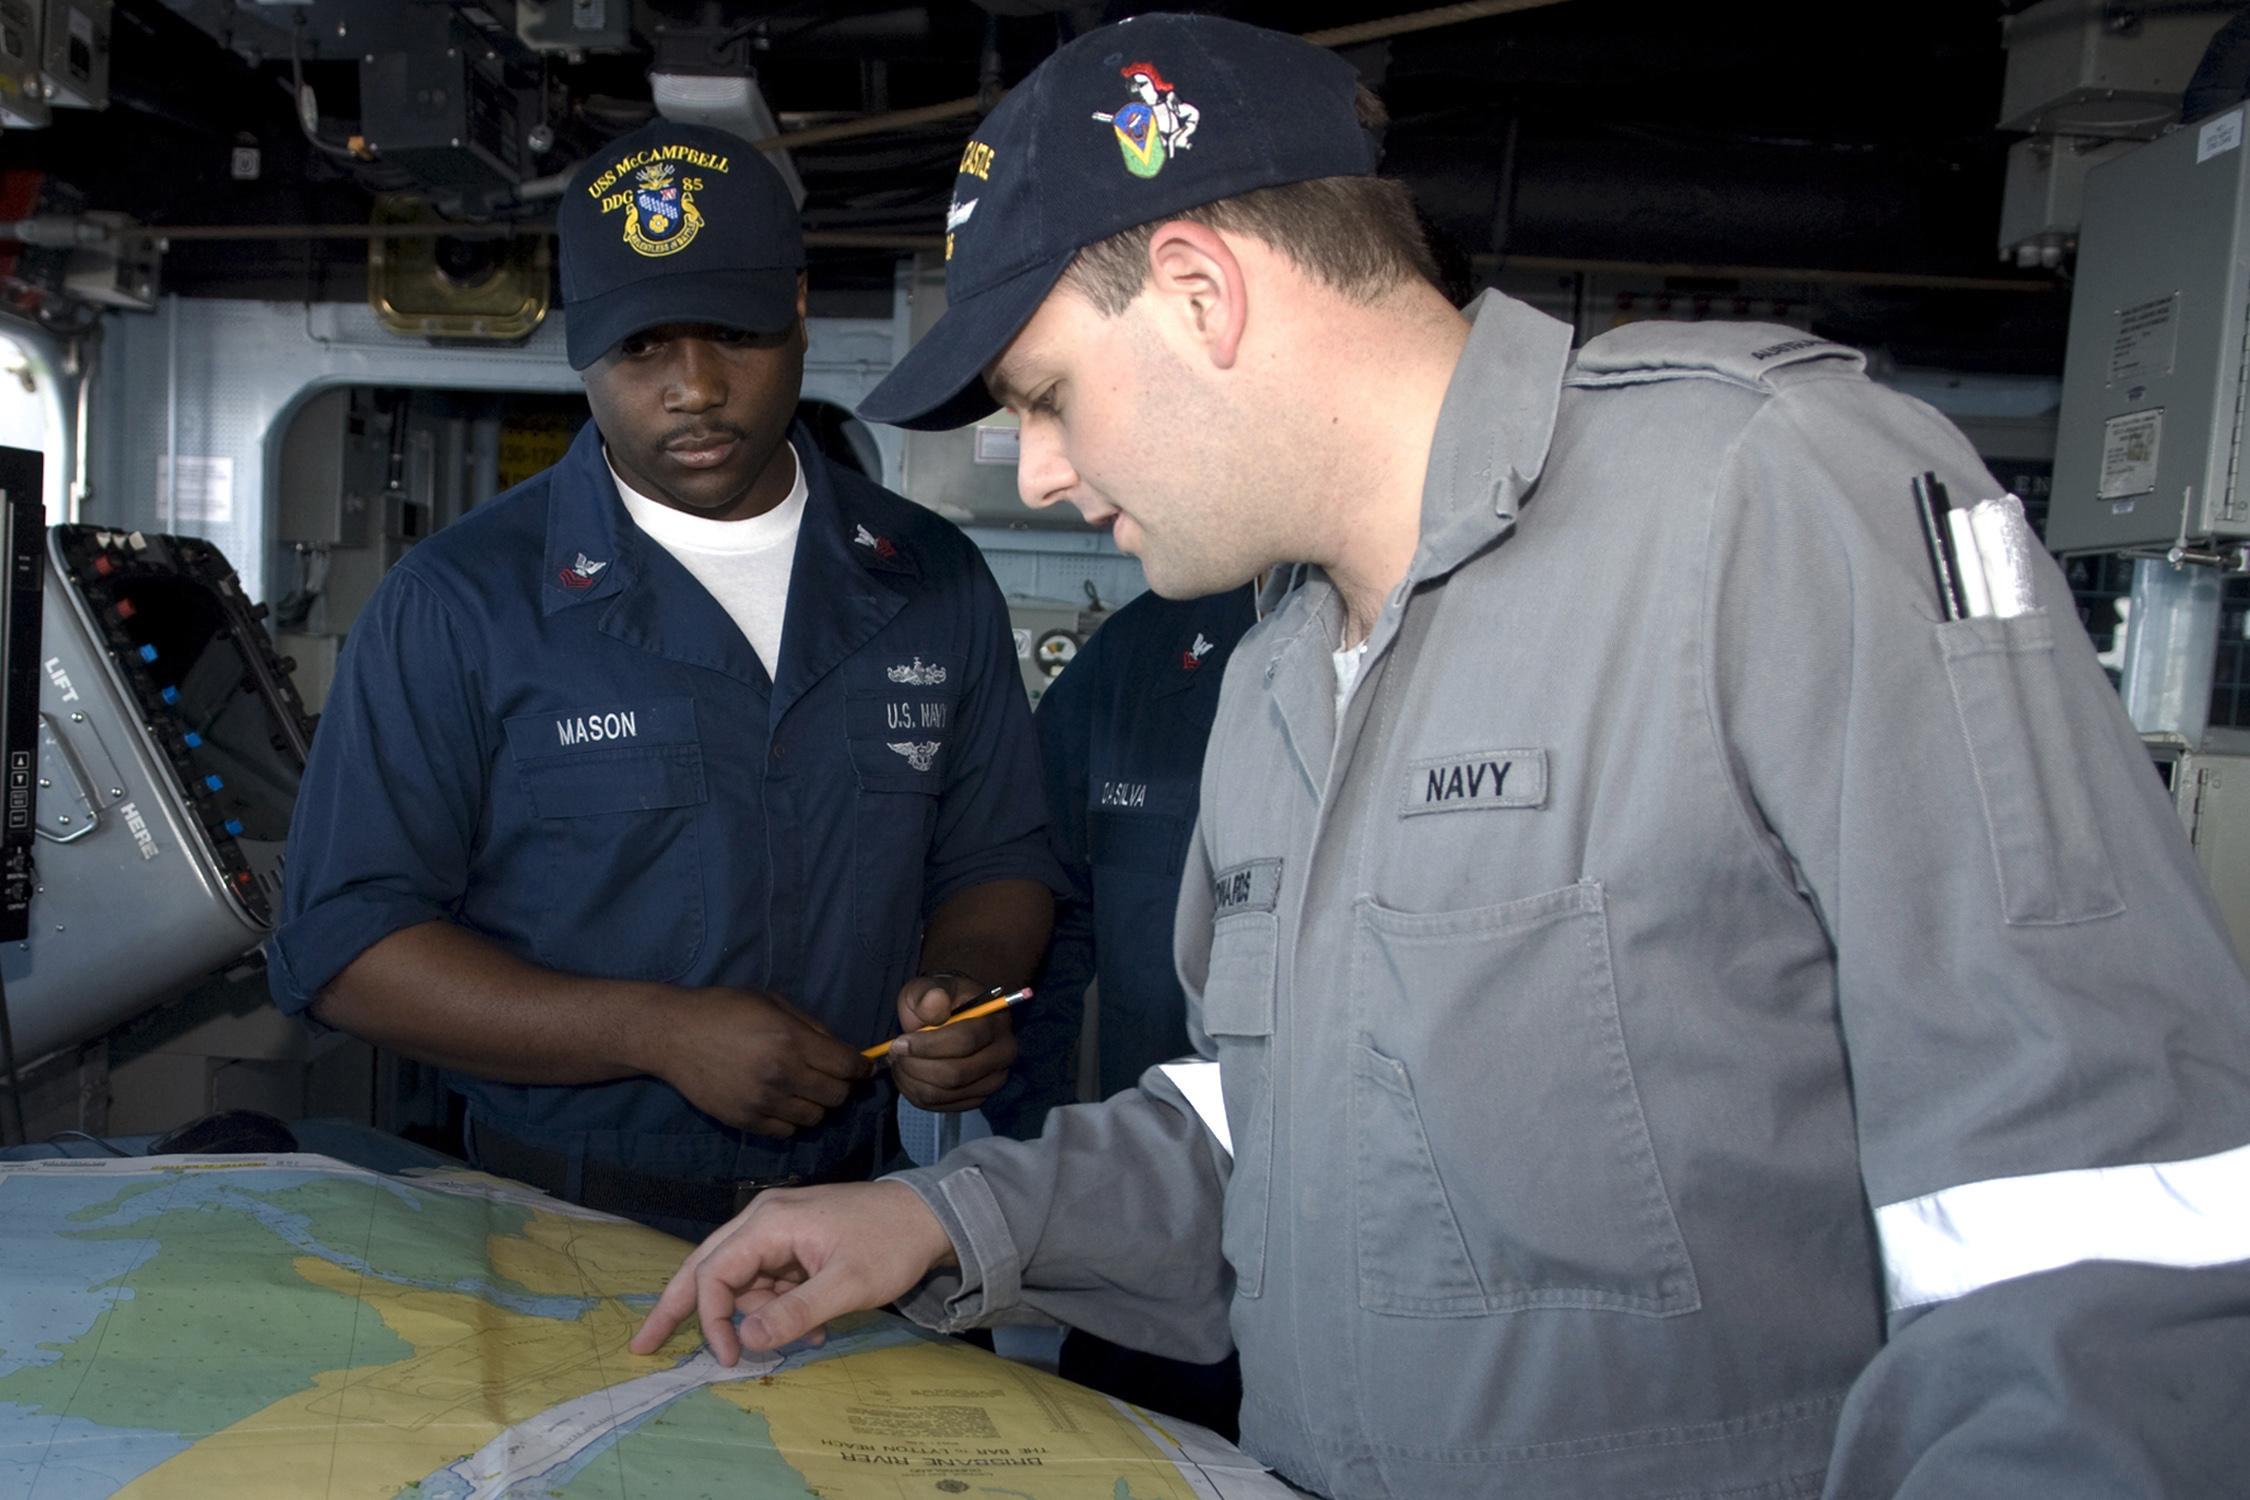 Military Pay Chart 2009: US Navy 090721-N-9123L-010 Quartermaster 1st Class Jory Mason ,Chart